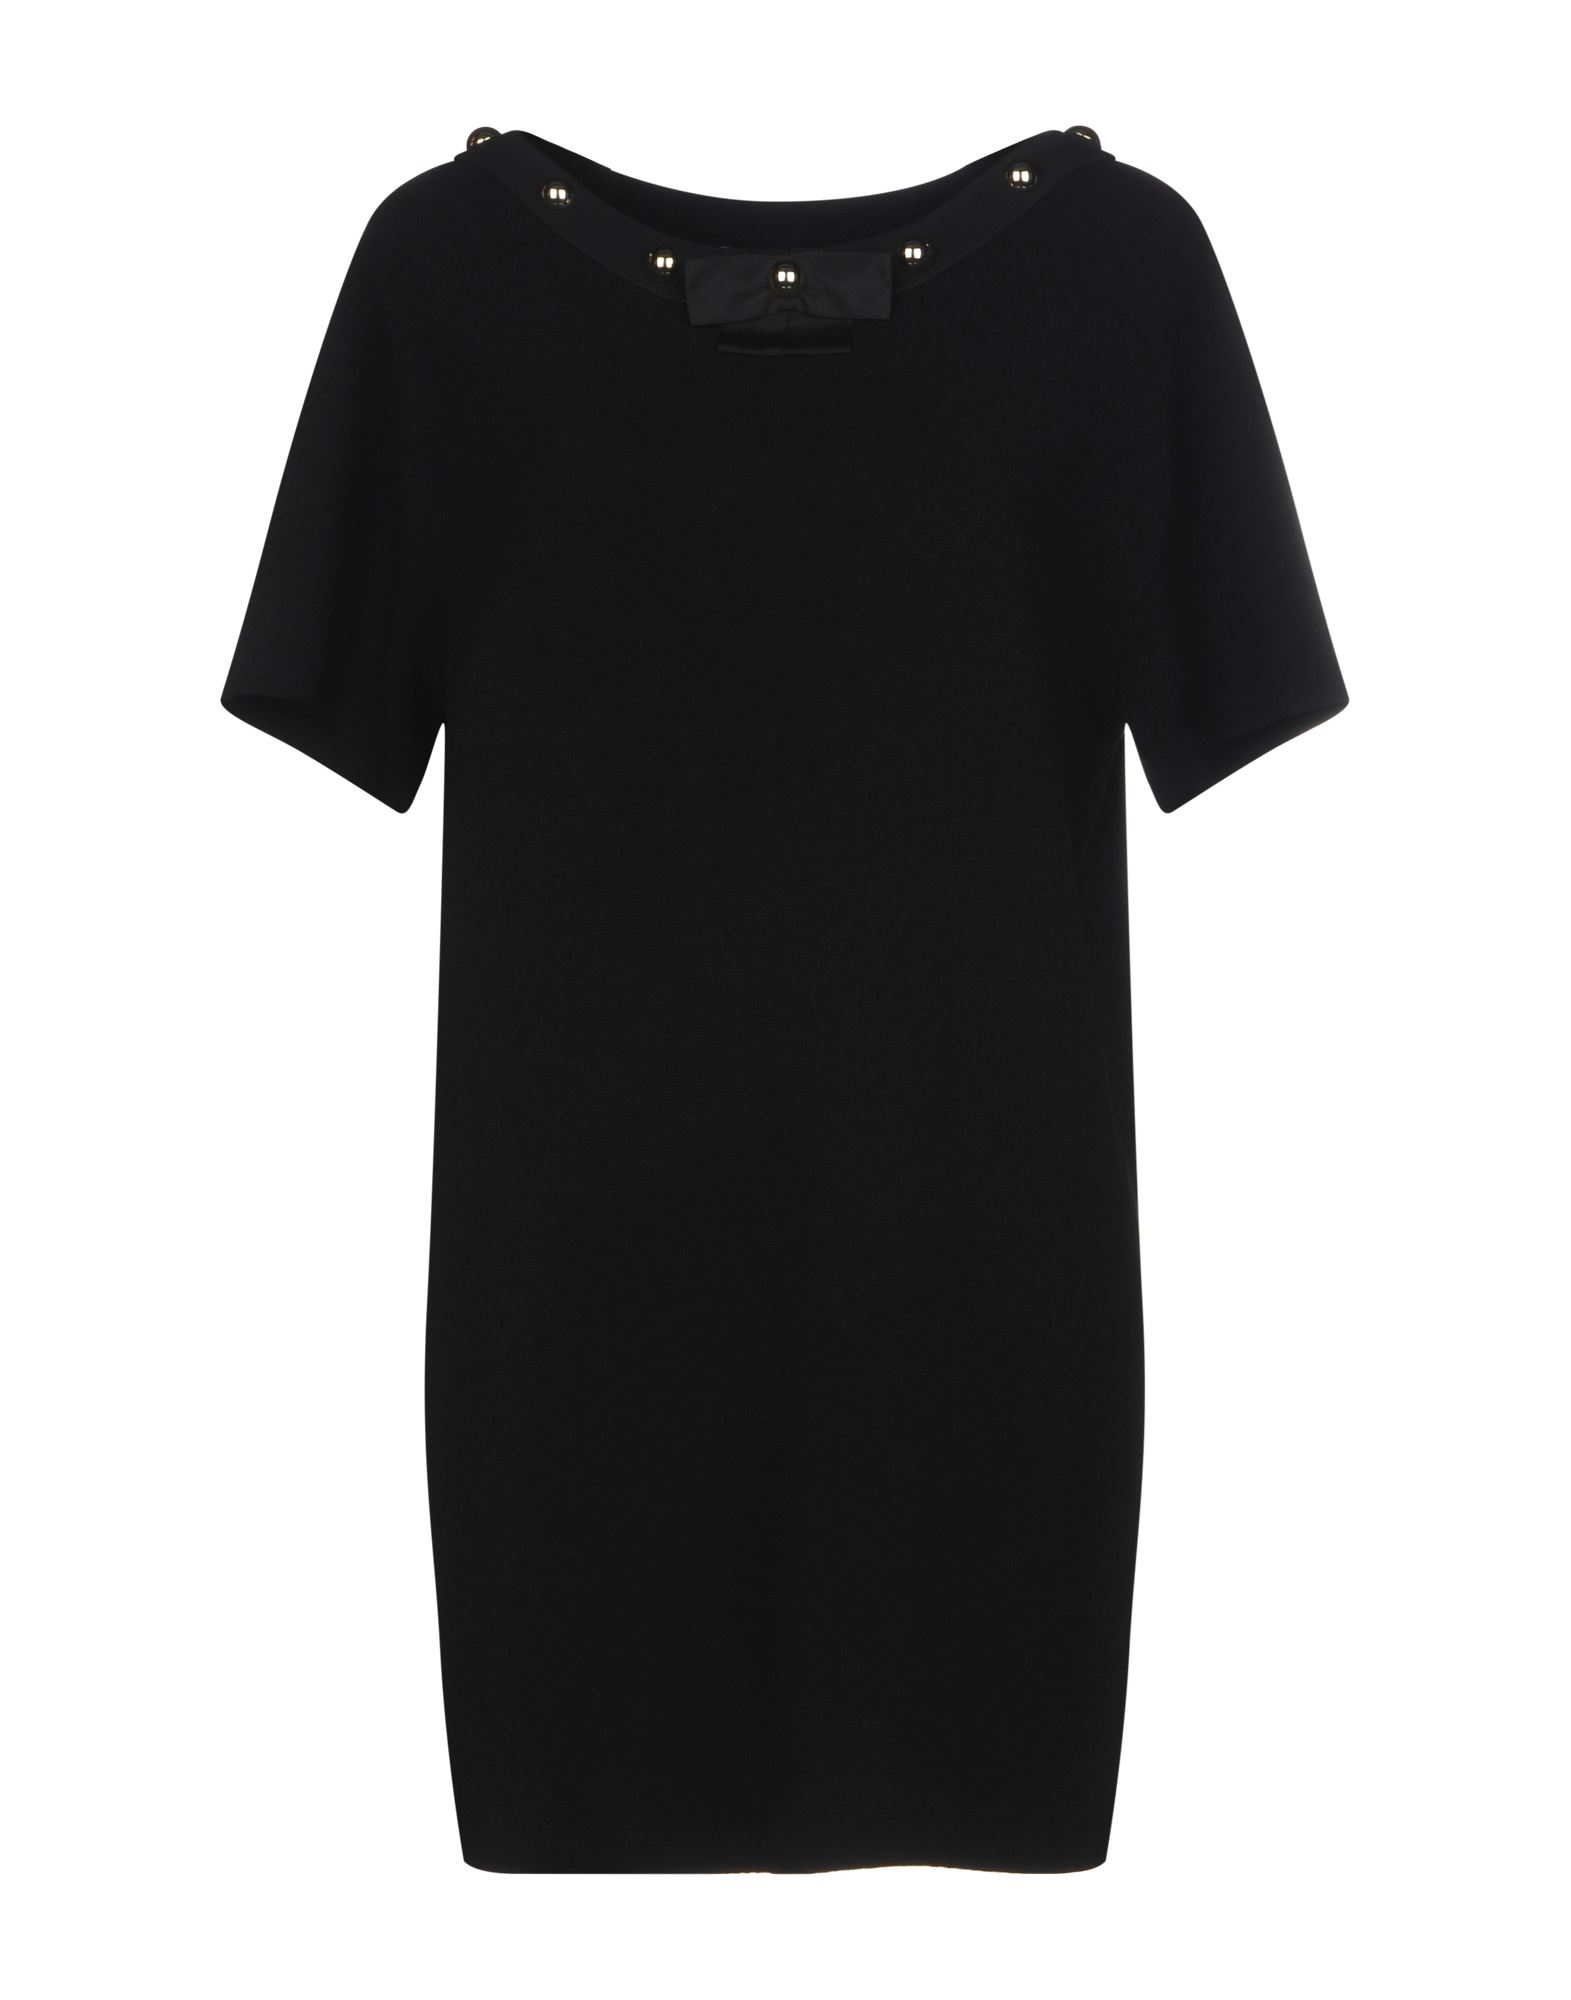 Vestito Corto Boutique Mos no donna - - 34826824UU  zum Verkauf 70% Rabatt